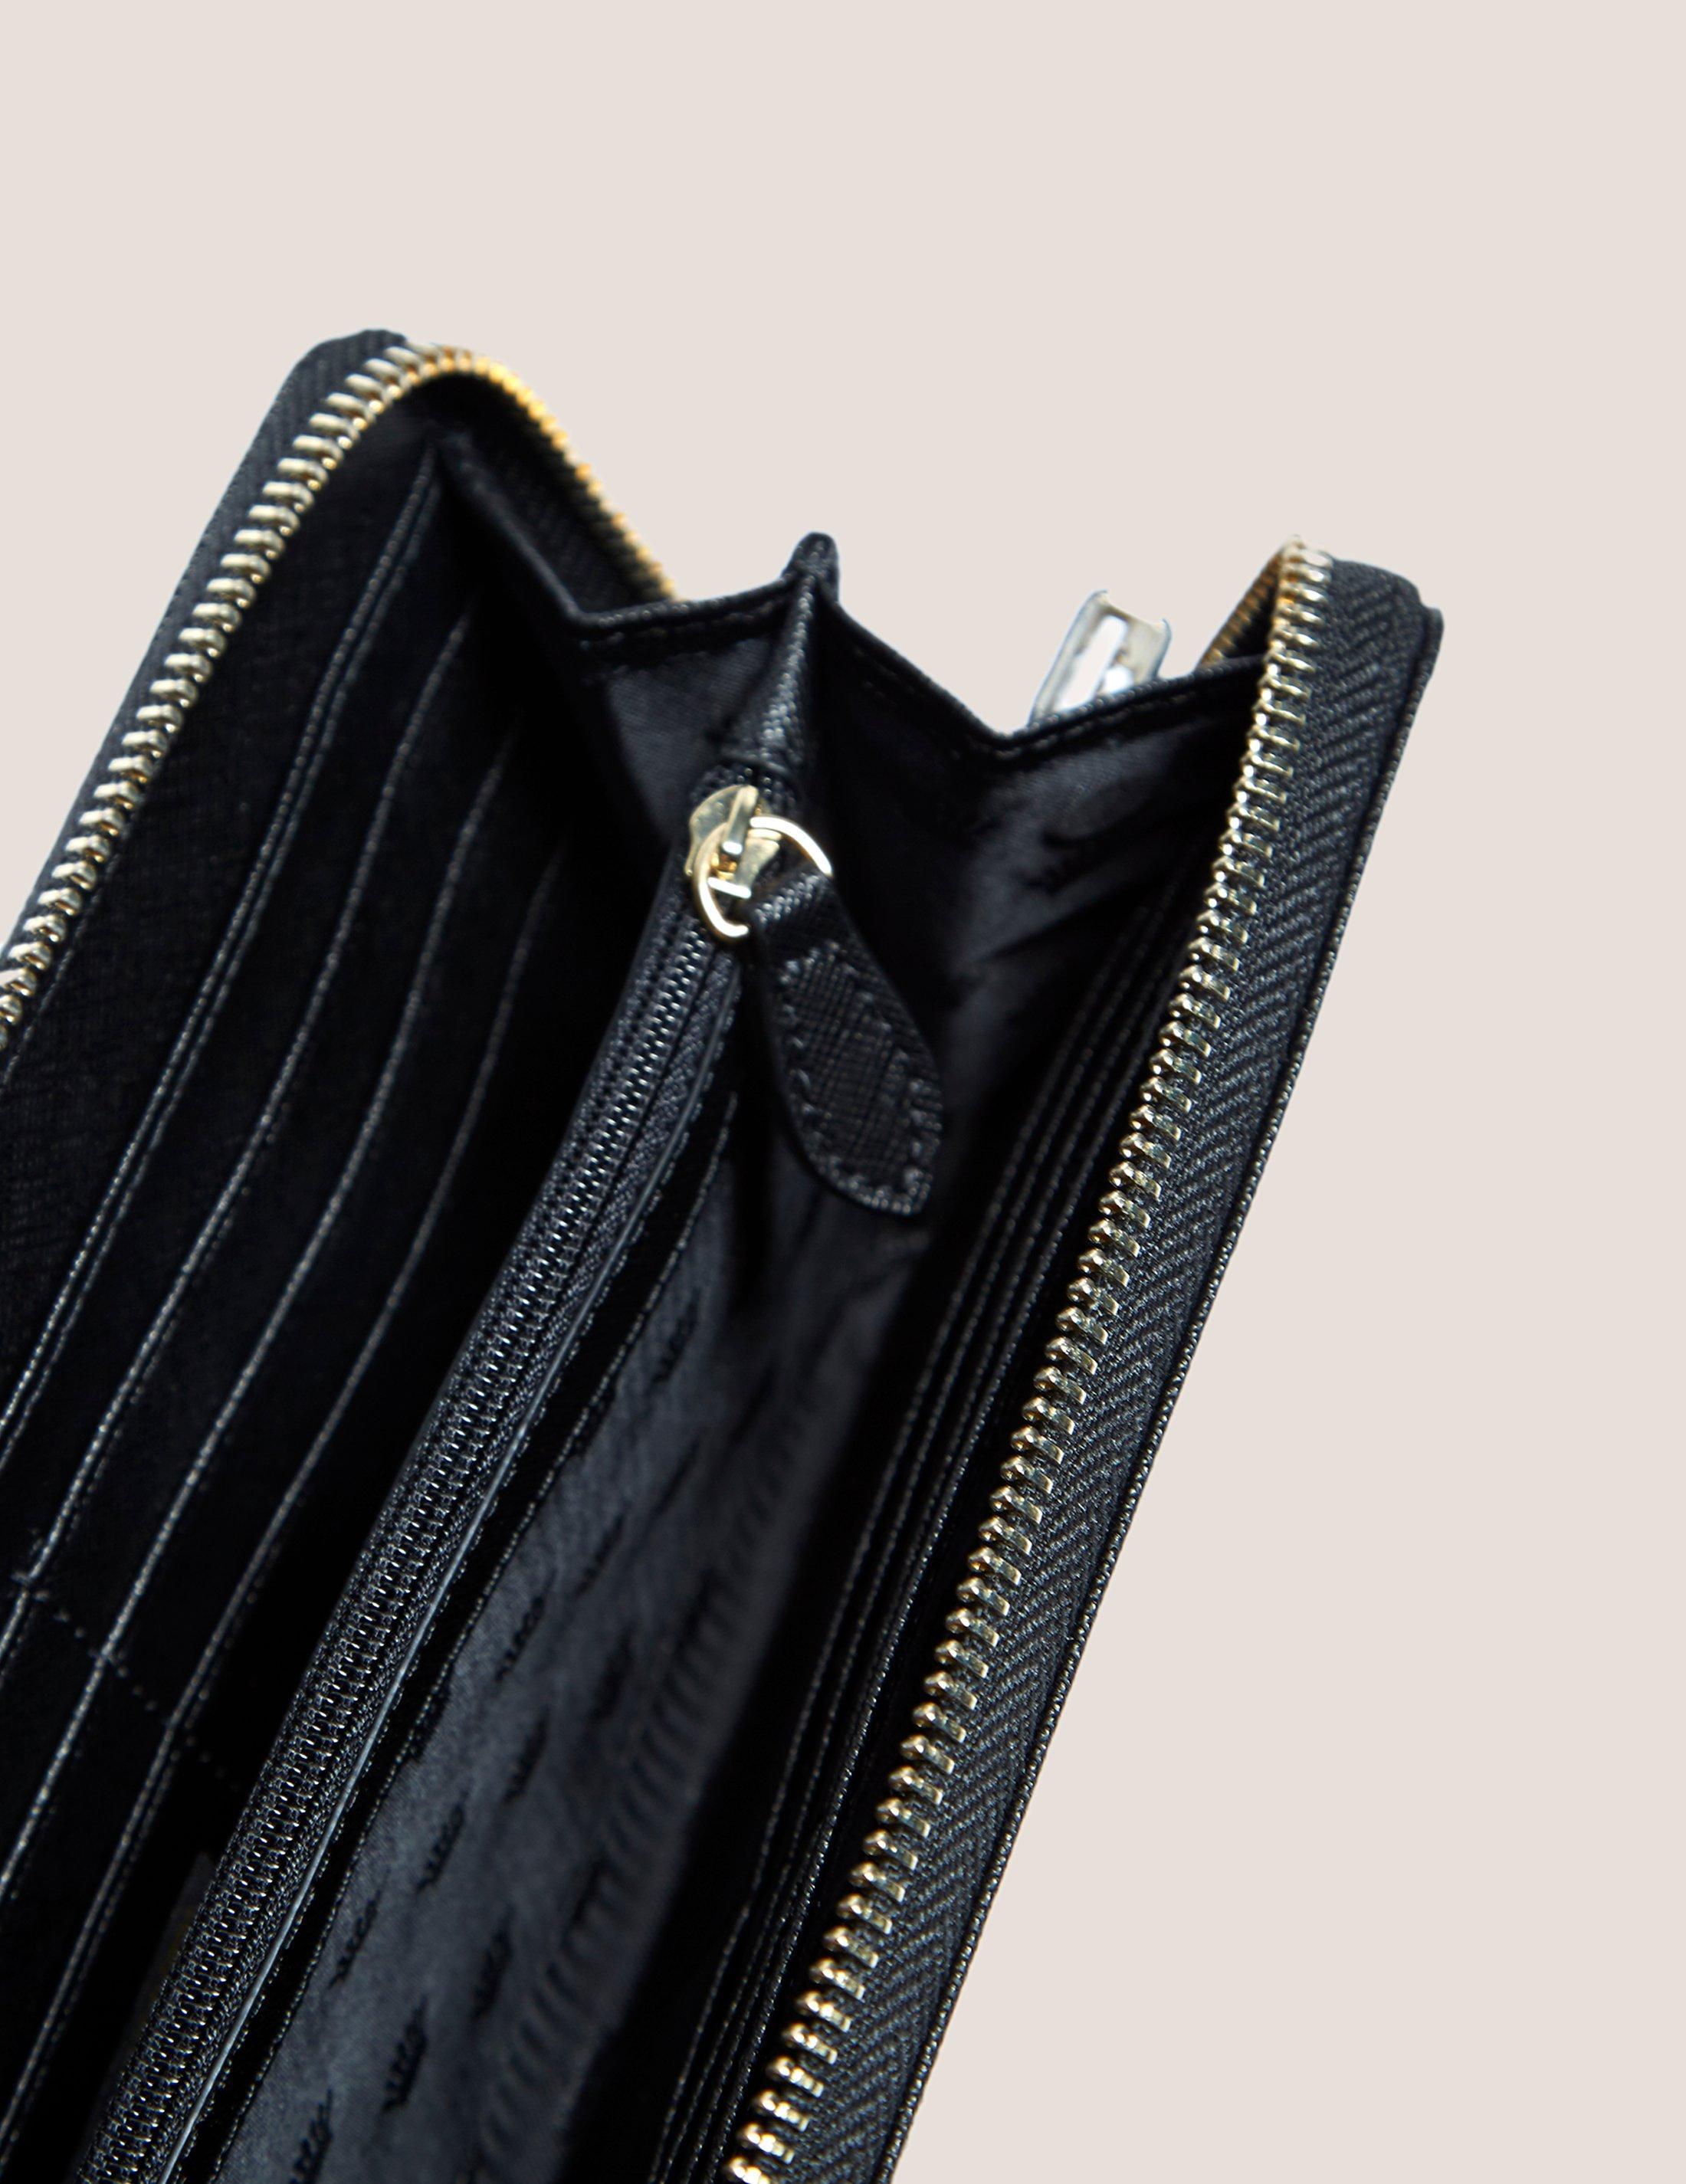 526s Travel Wallet Purse Neck Pouch Passport Holder Small Messenger Bag Silver